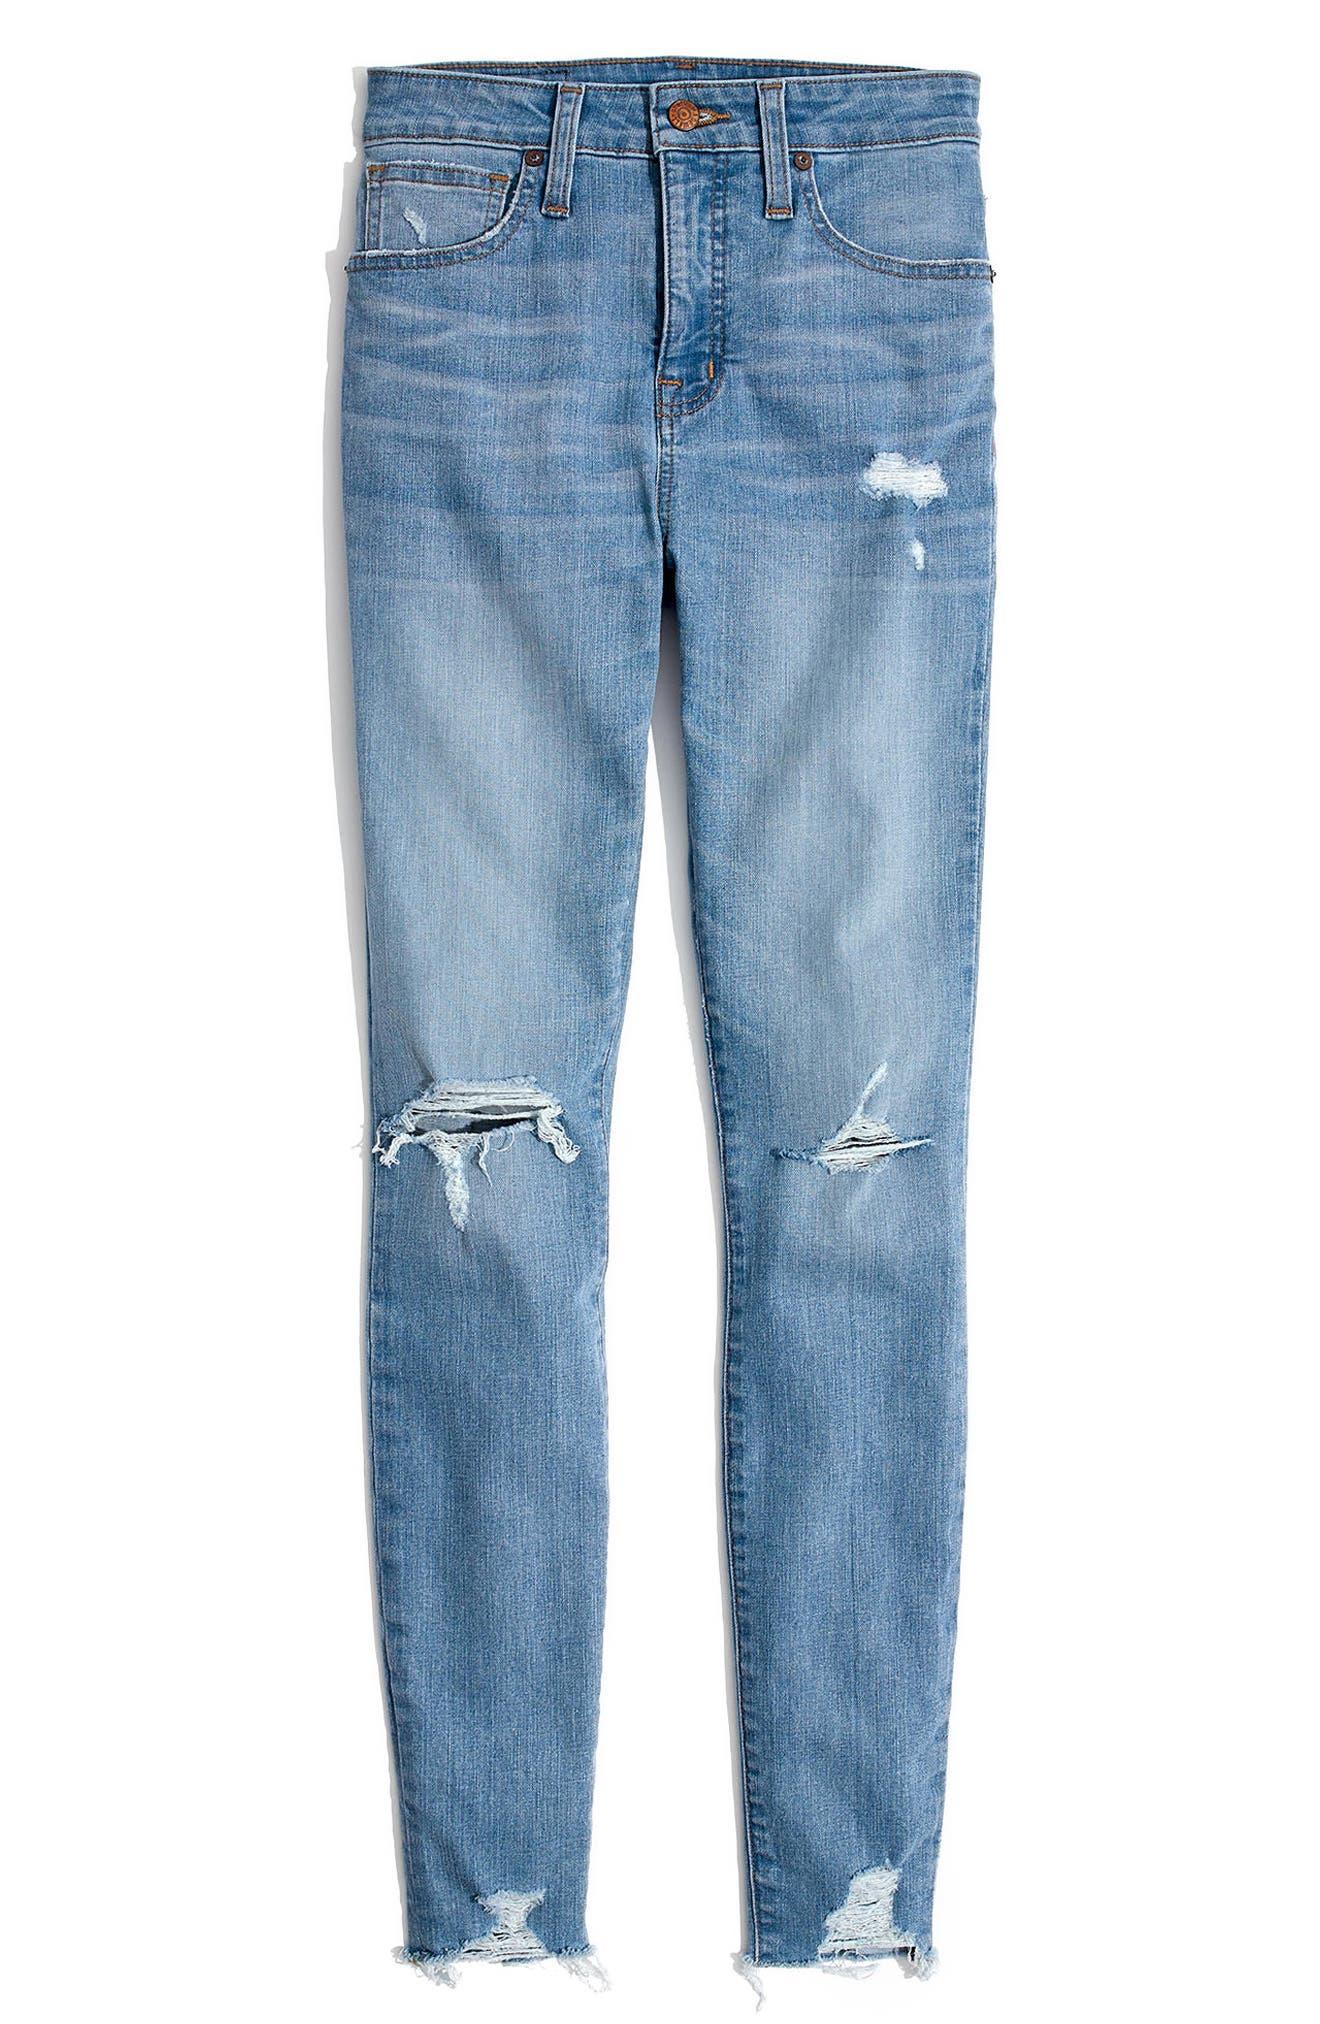 Curvy High Waist Distressed Hem Skinny Jeans,                             Alternate thumbnail 5, color,                             Ontario Wash